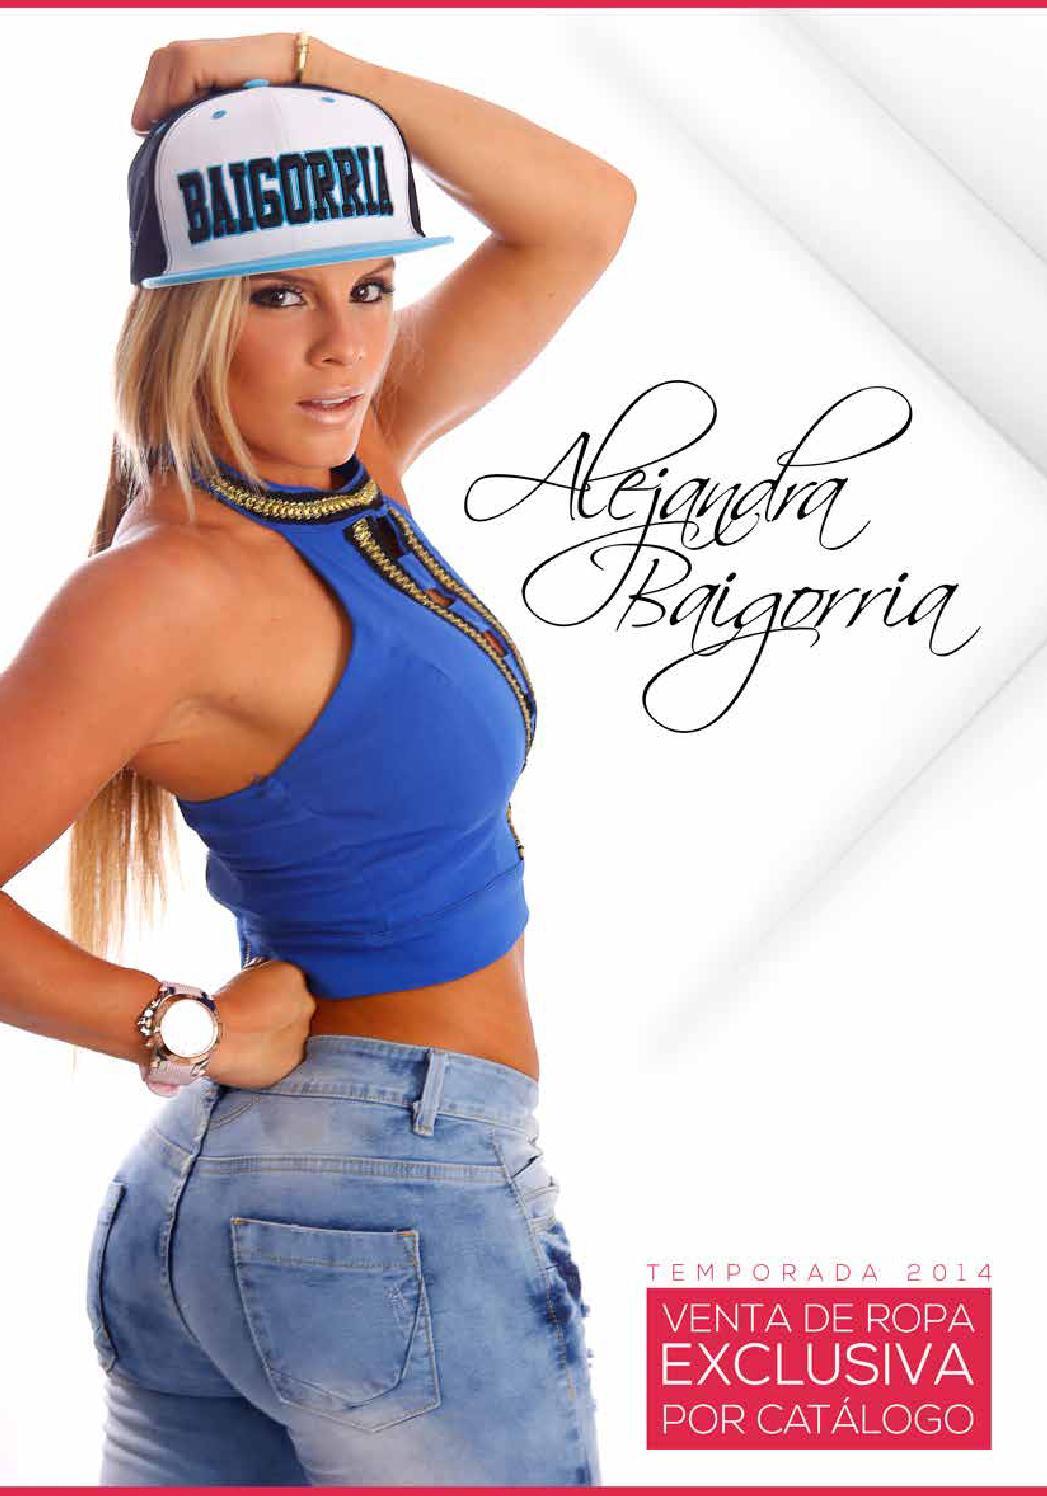 d0348eea26f38 Catalogo alejandra baigorria issuu com by ropa alejandra baigorria - issuu